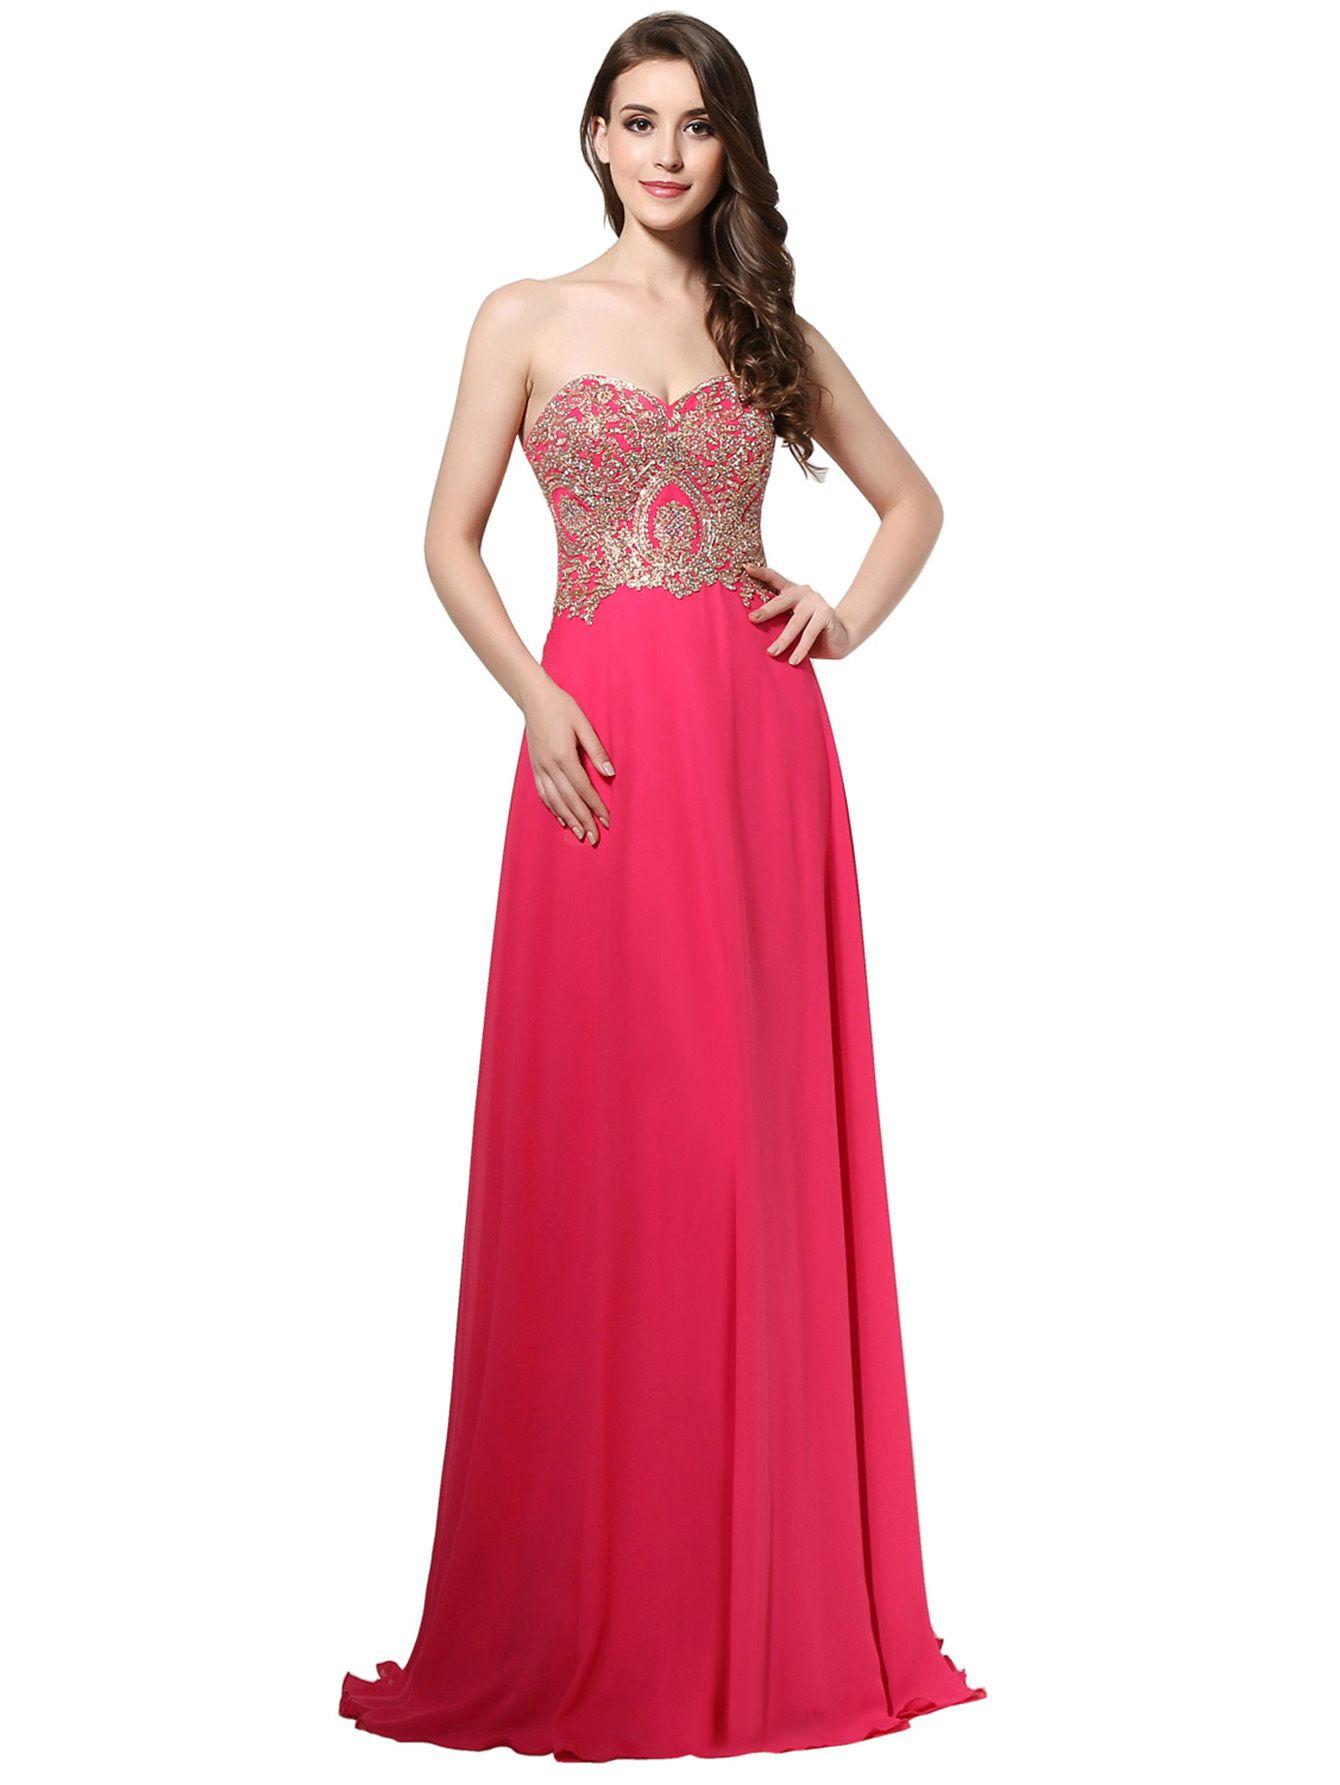 a2d53b44c Vestido de dama de honor con escote en forma de corazón con adornos de  pedrería de chifón-(Sheinside)